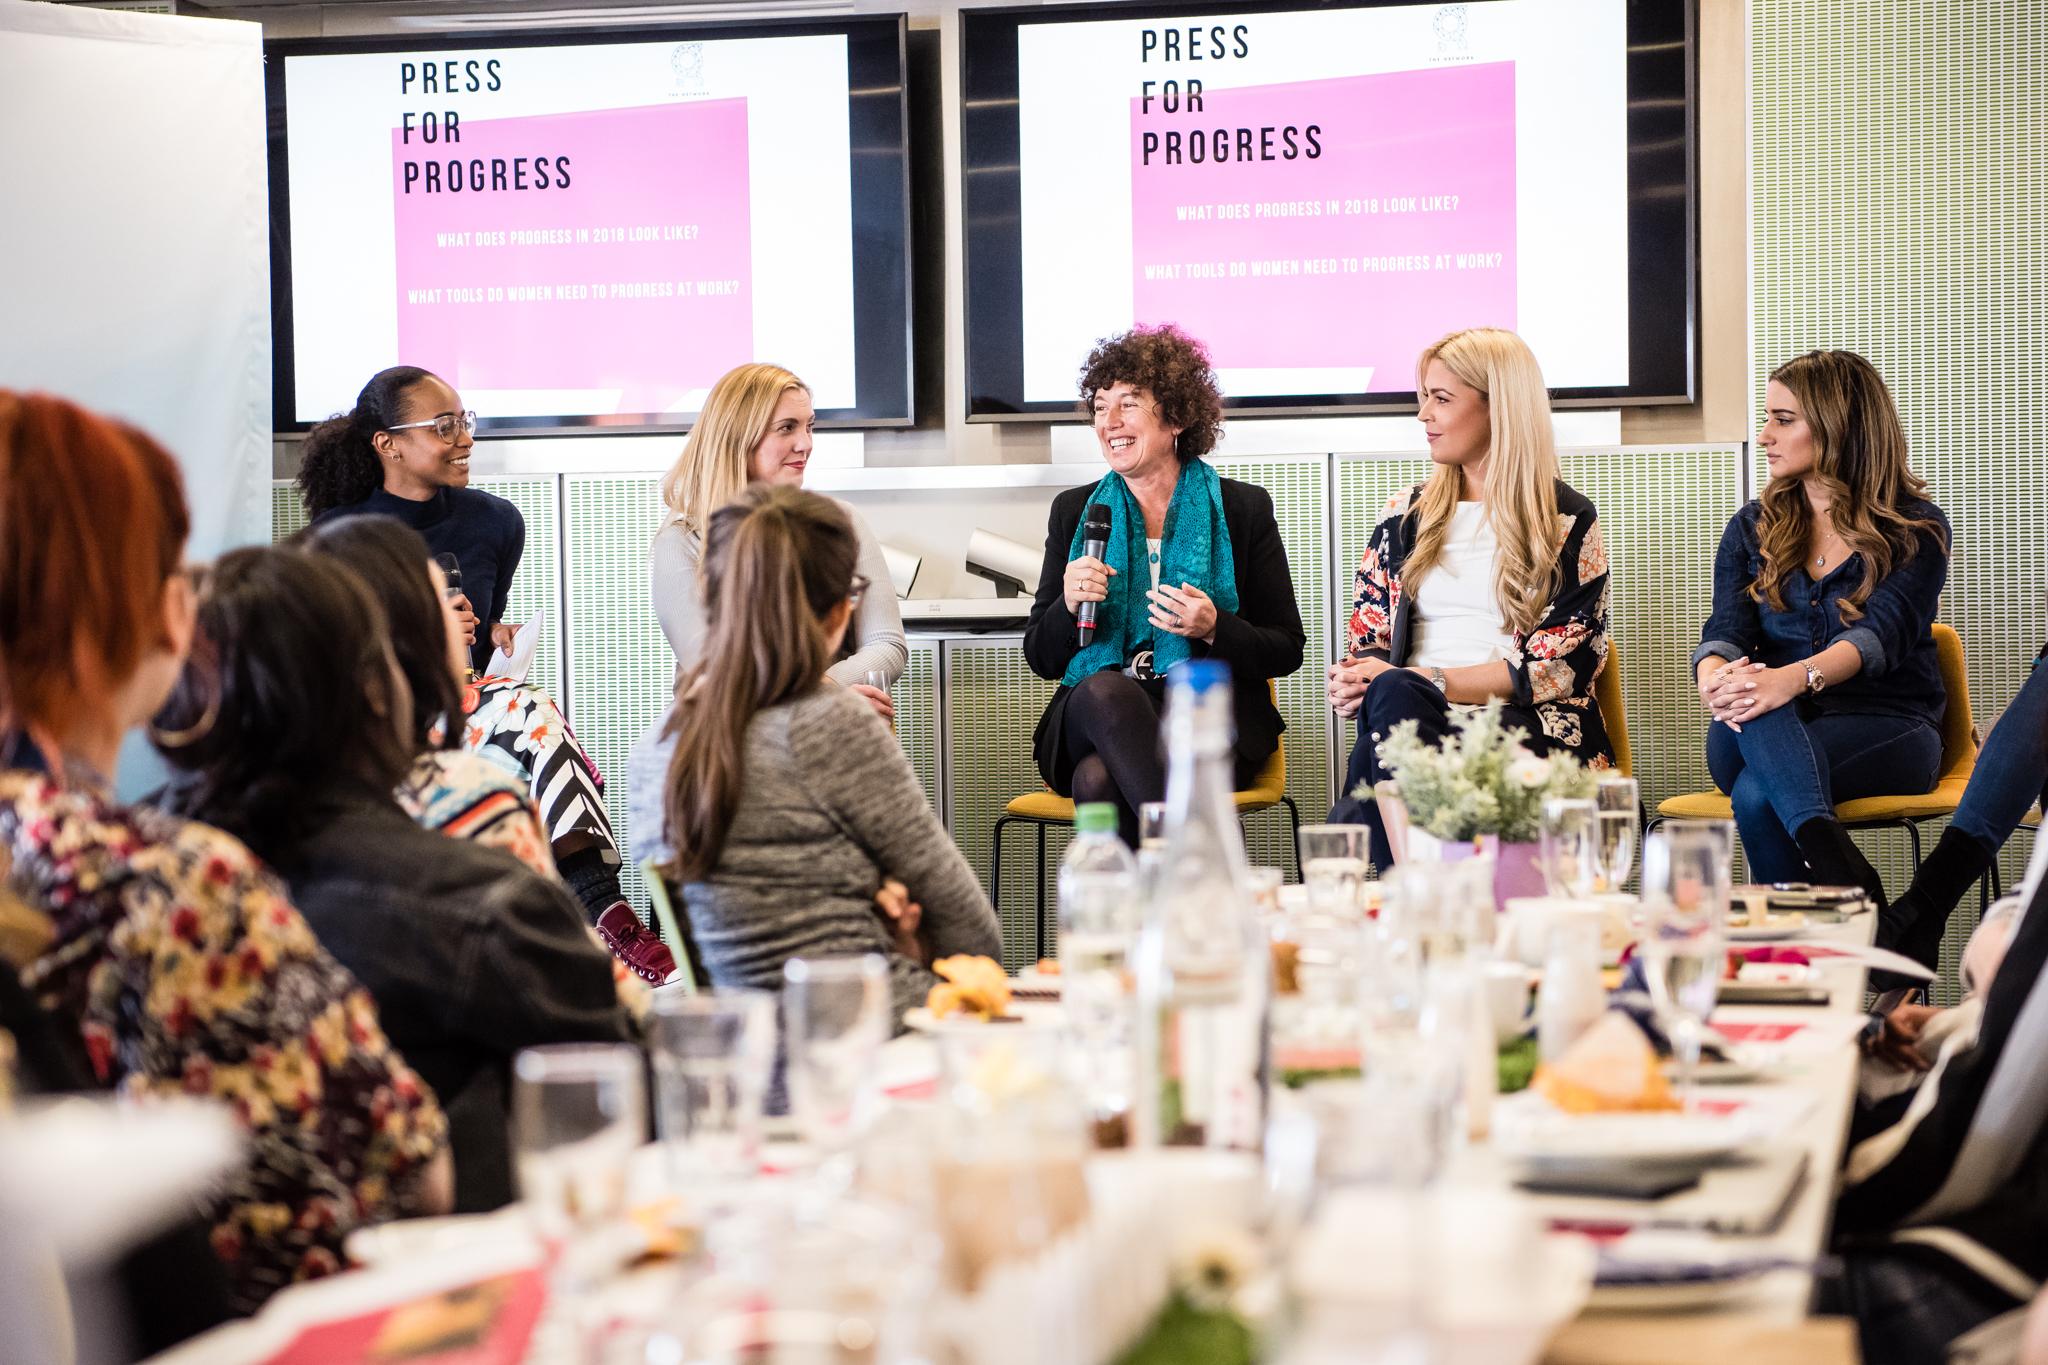 Press for Progress x International Women's Day 2018  GLOBAL HQ